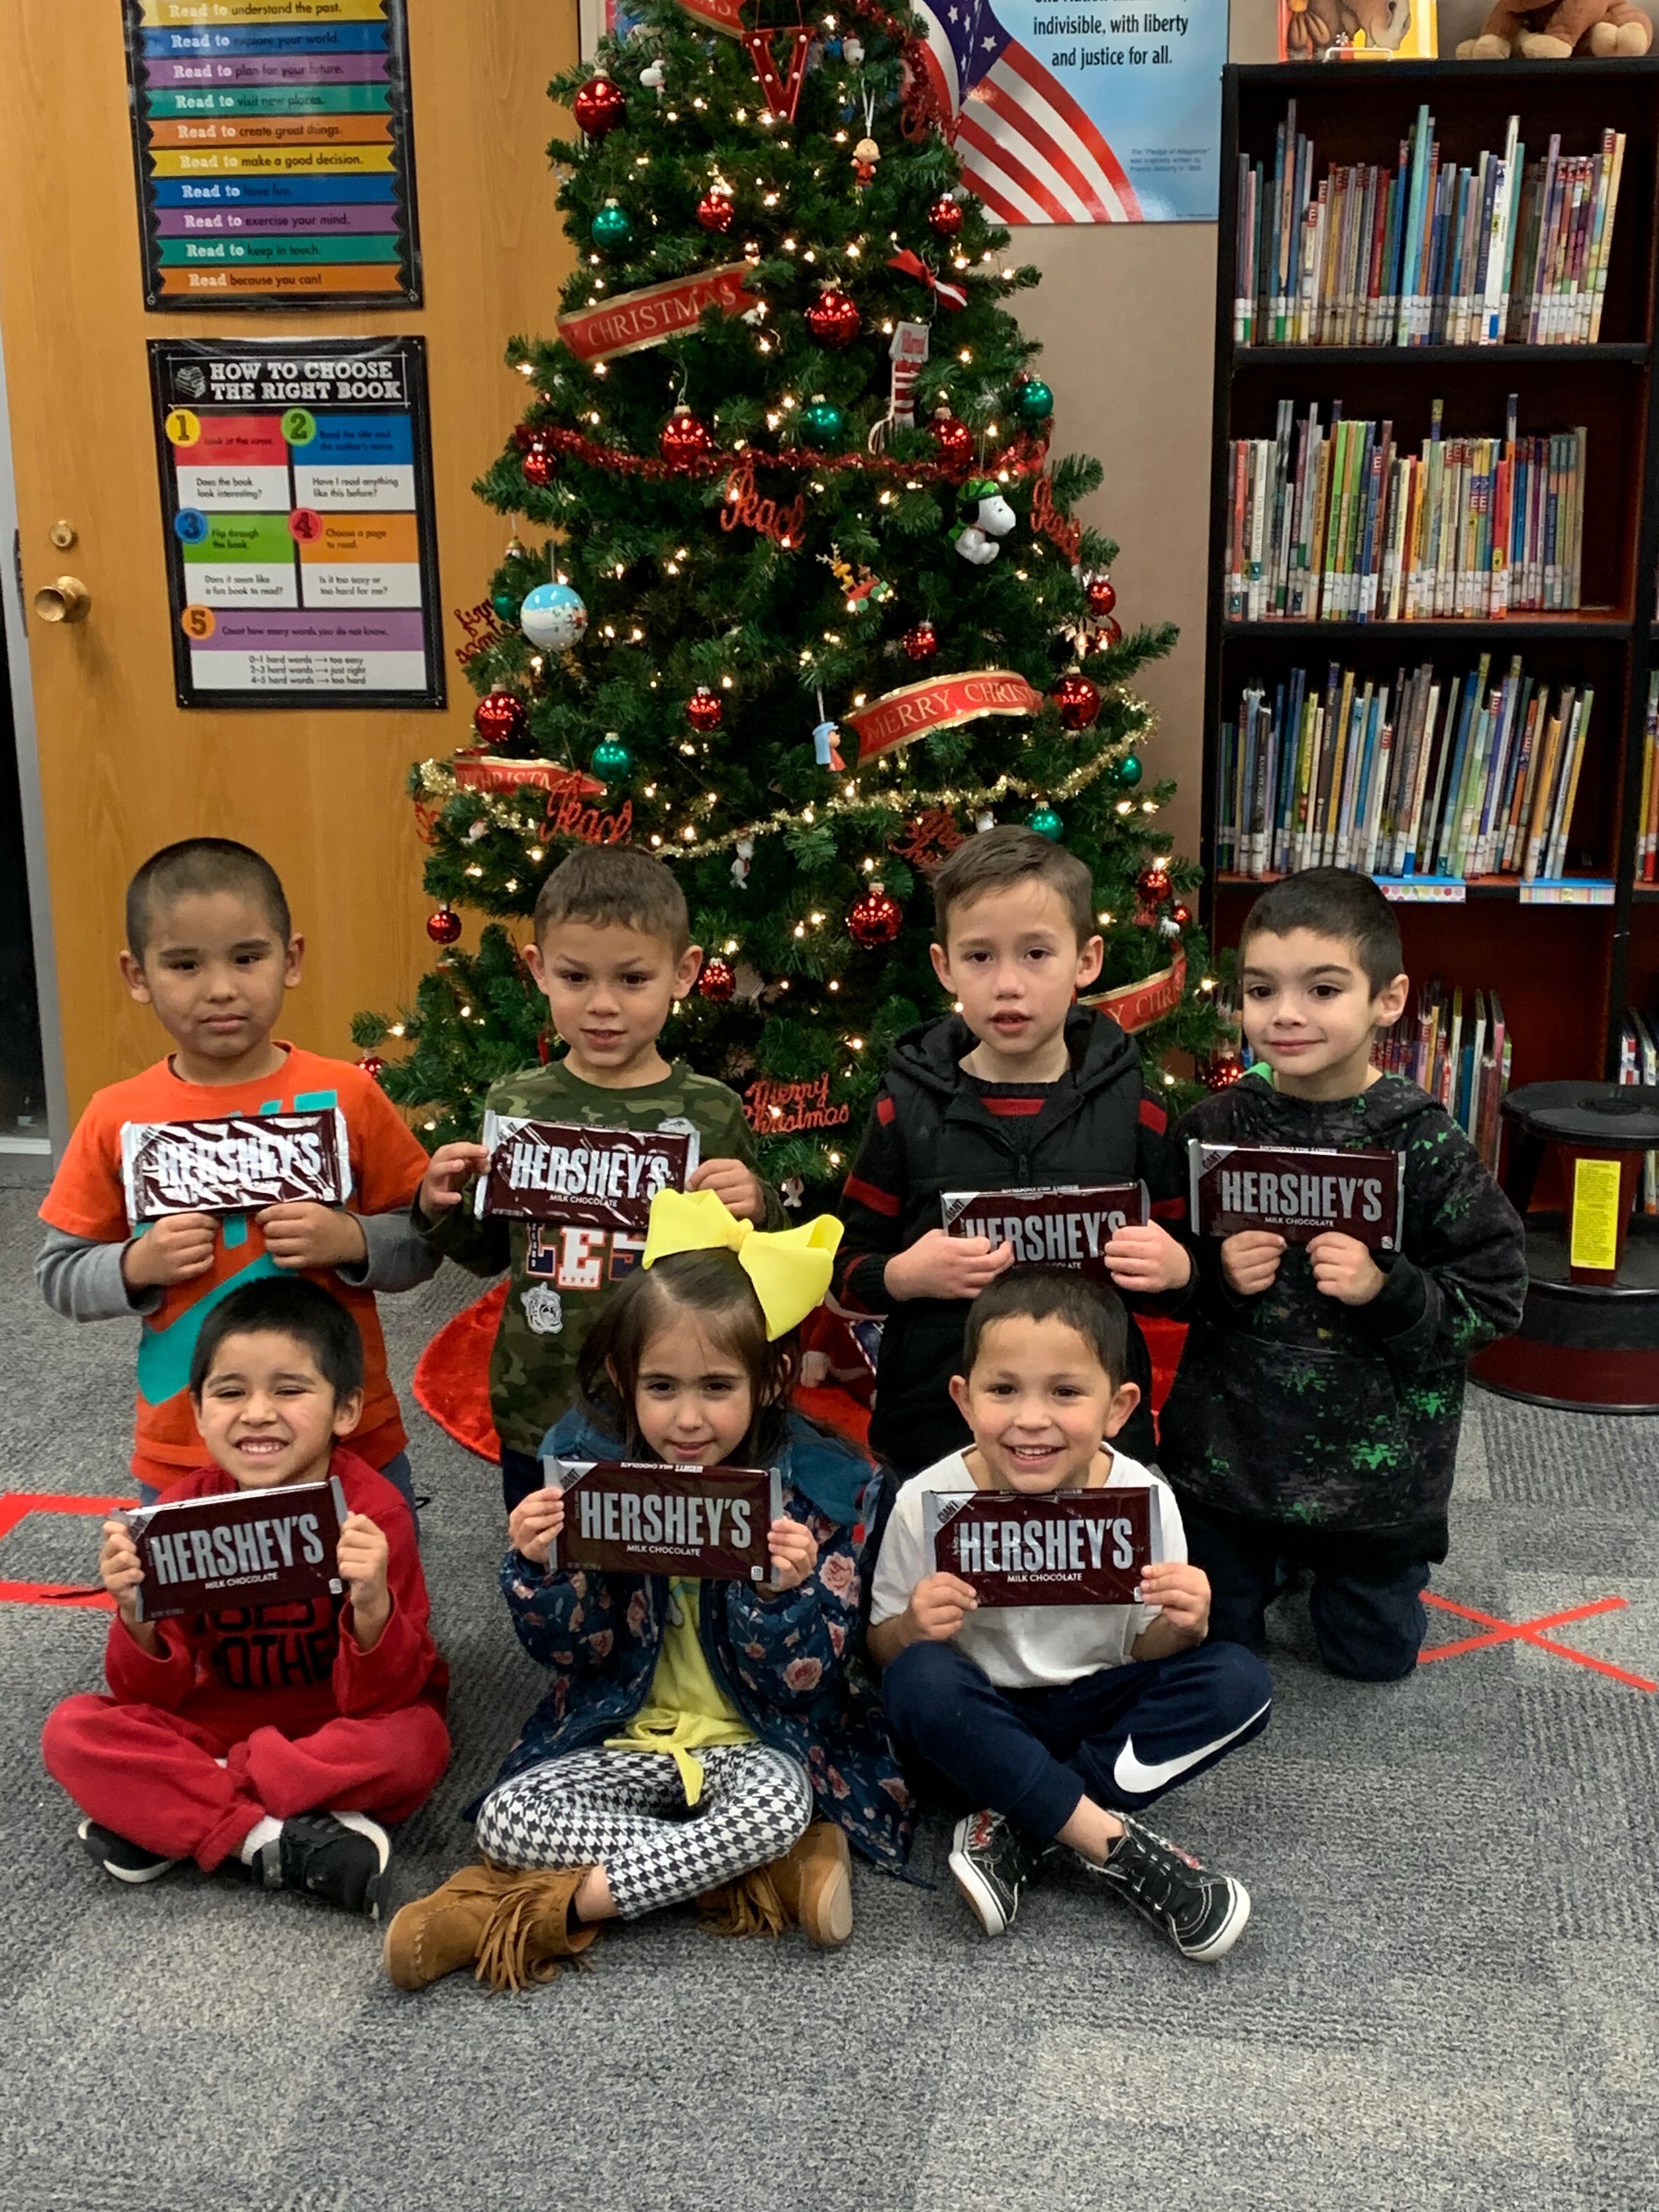 Most Signatures, Mrs. Smith's Class Dec. 2 - 18, 2019